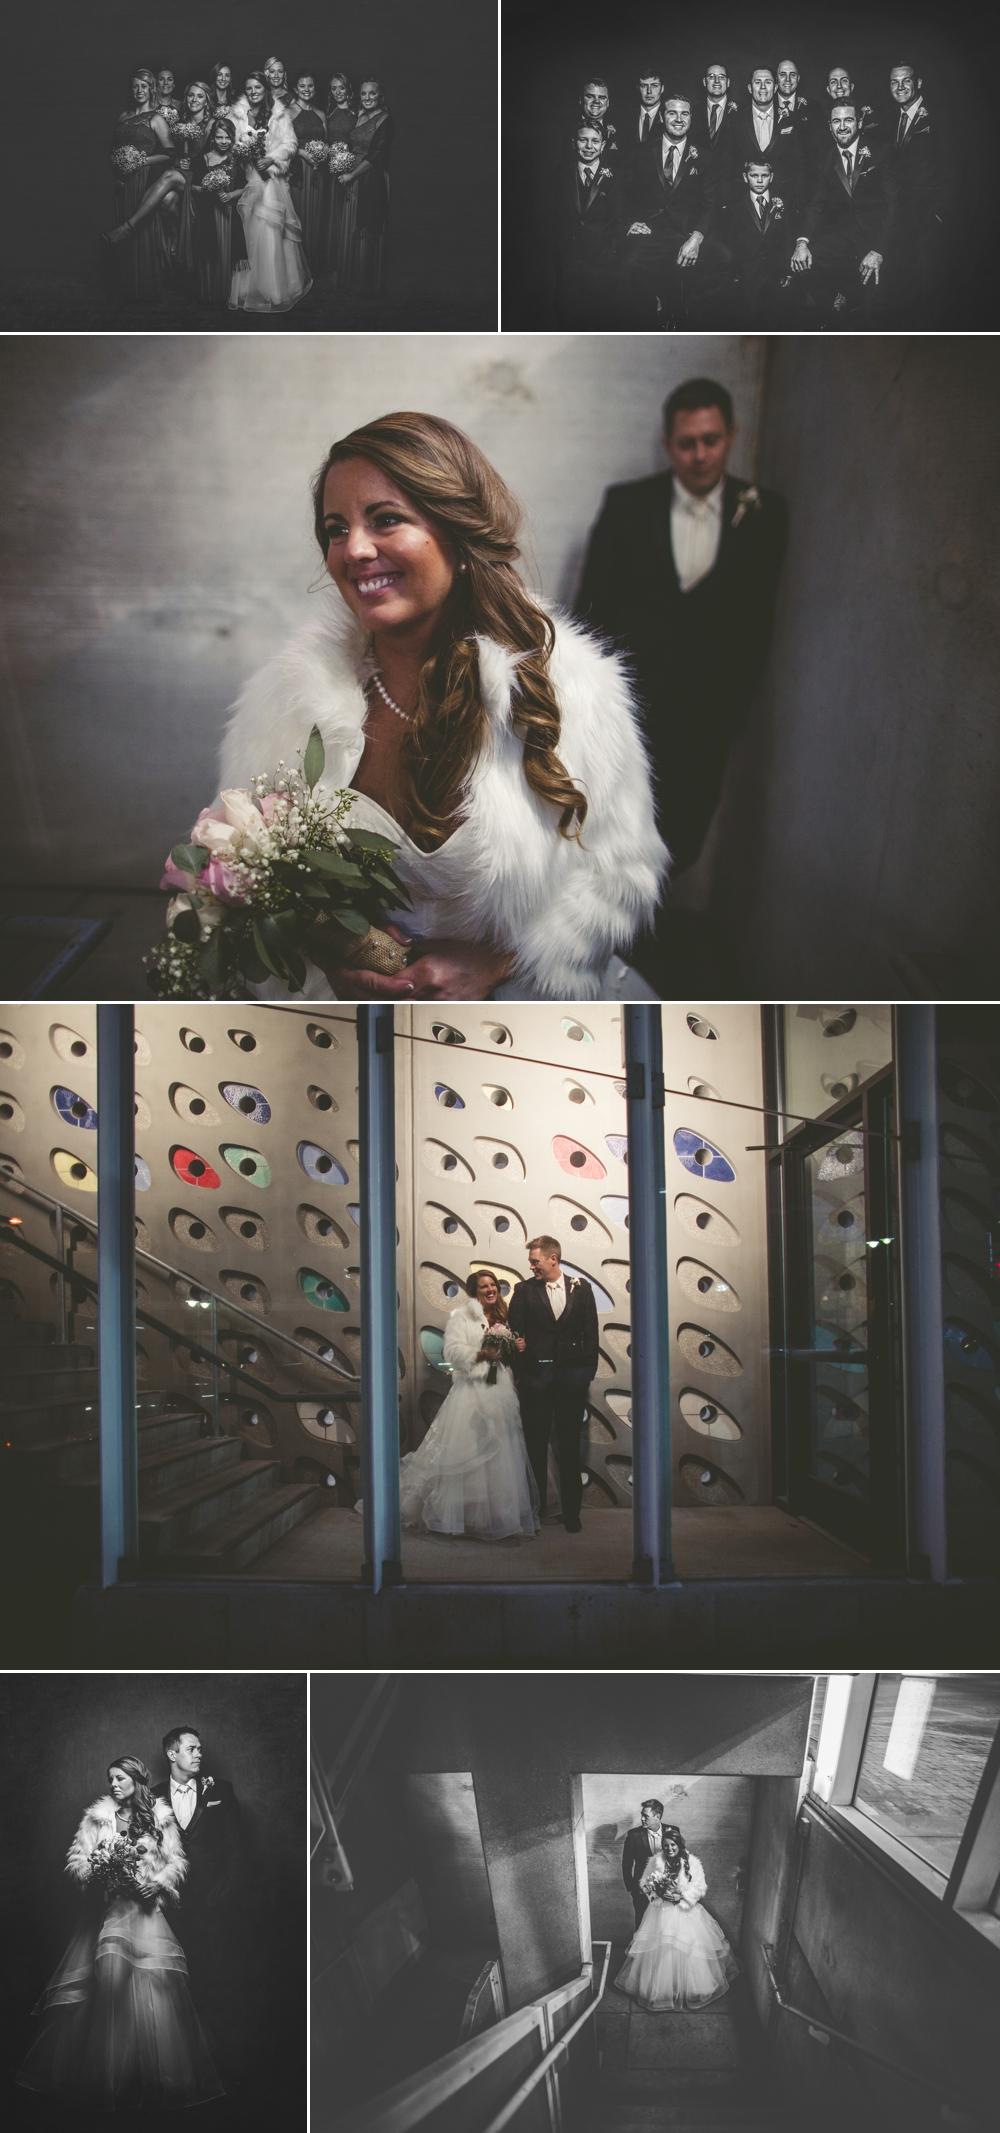 jason_domingues_photography_best_kansas_city_wedding_photographer_kc_weddings_garment_house_0003.JPG